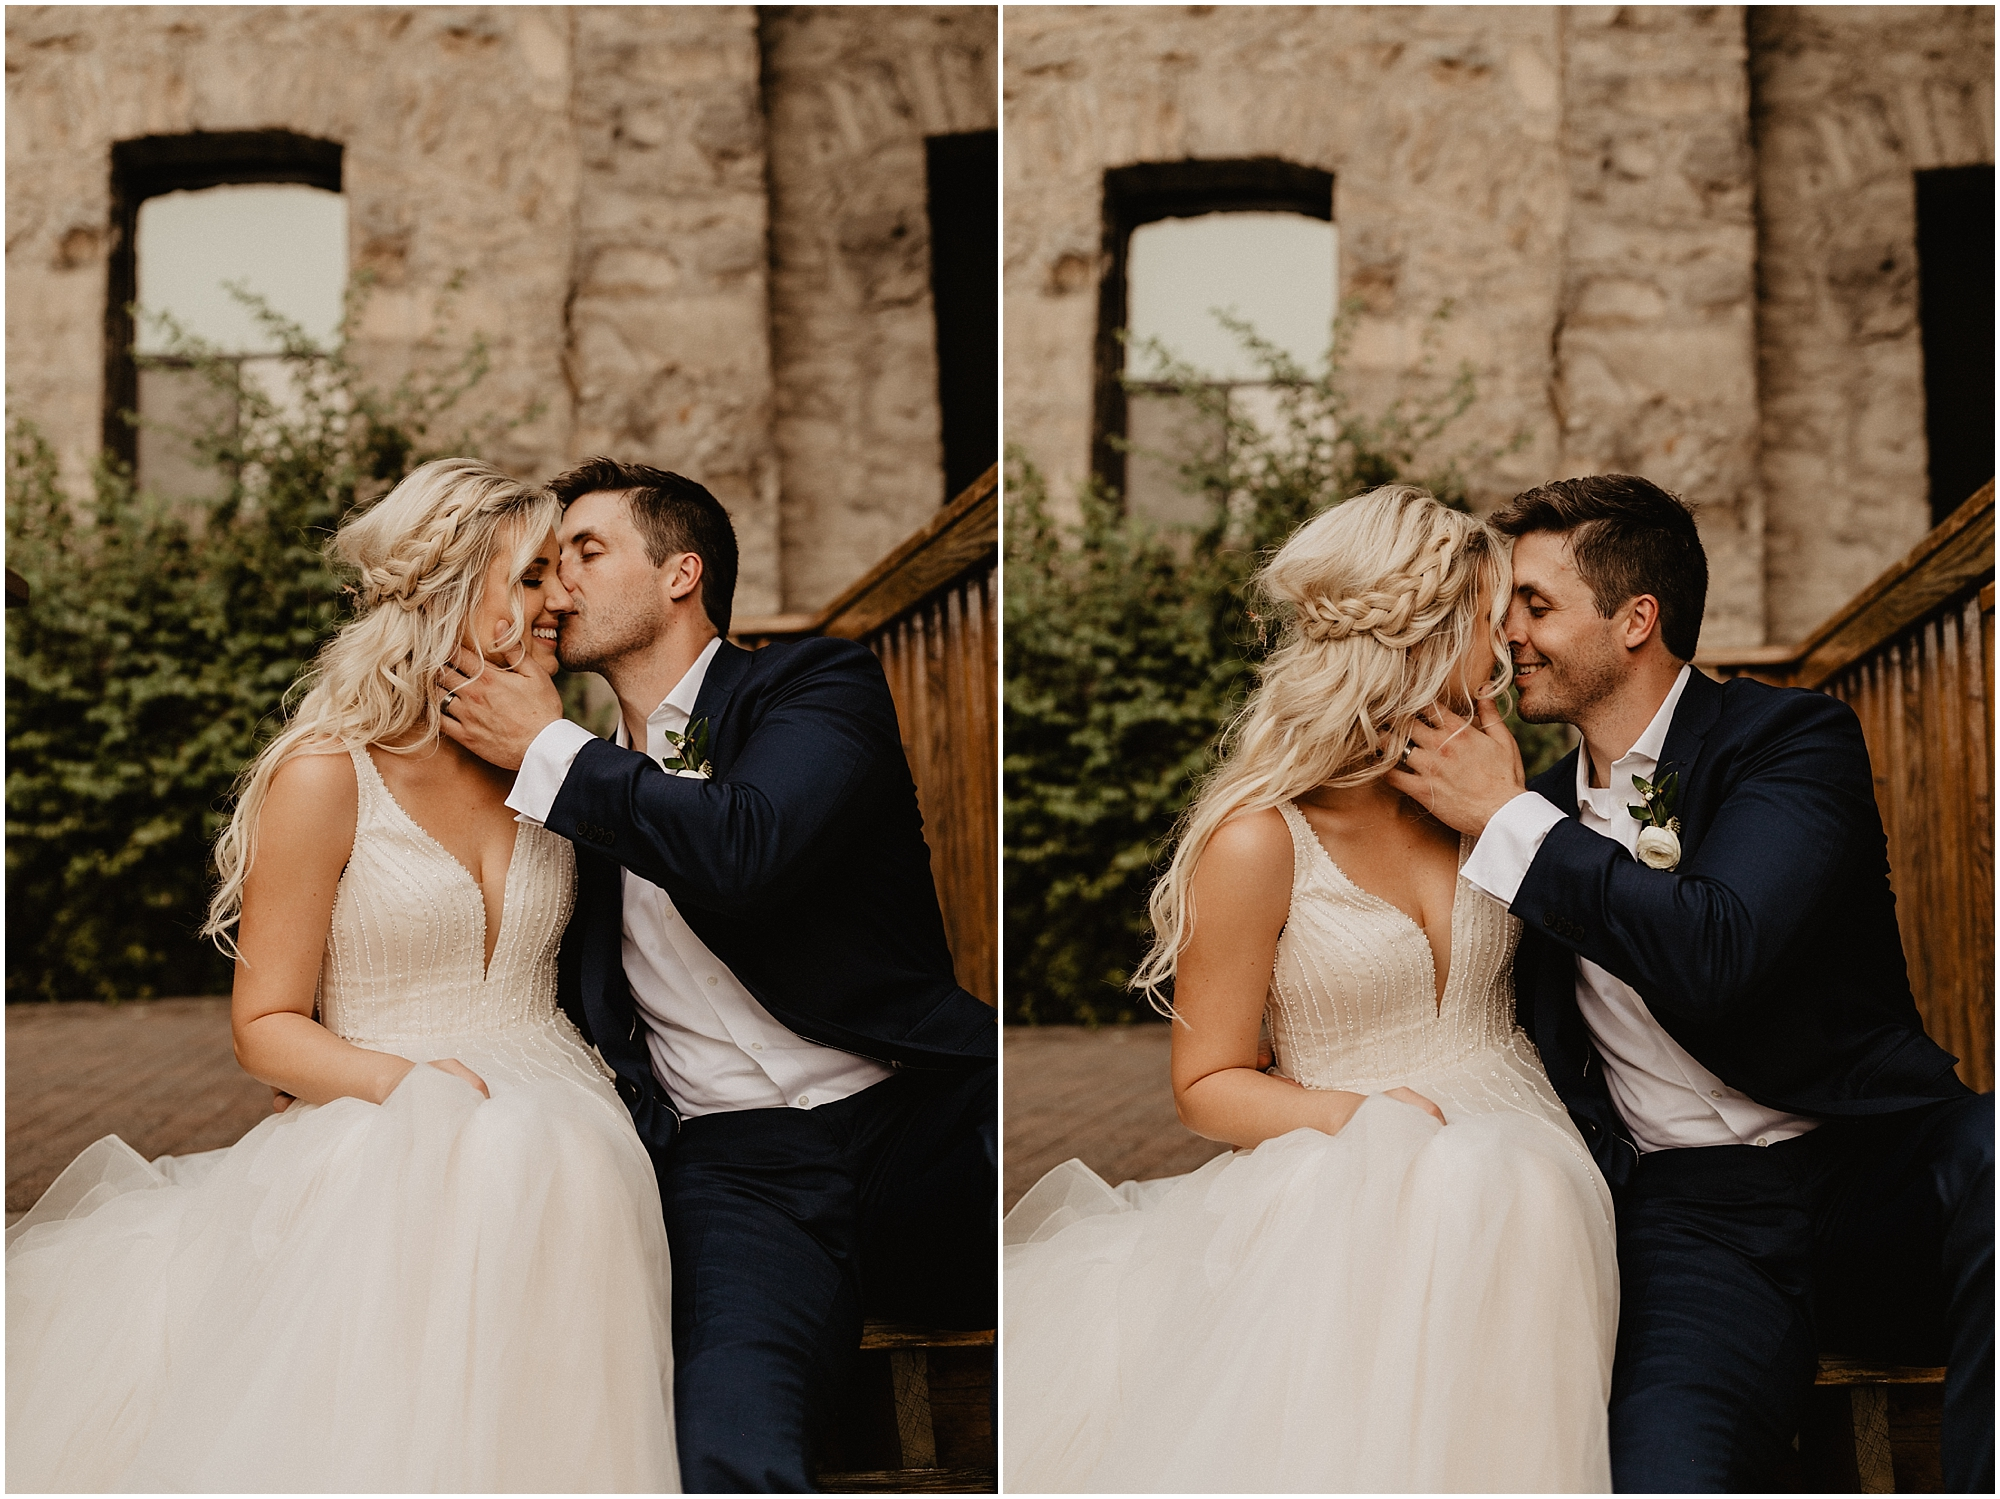 Chateau Rive Spokane Wedding Cassie Trottier Photography1127.jpg